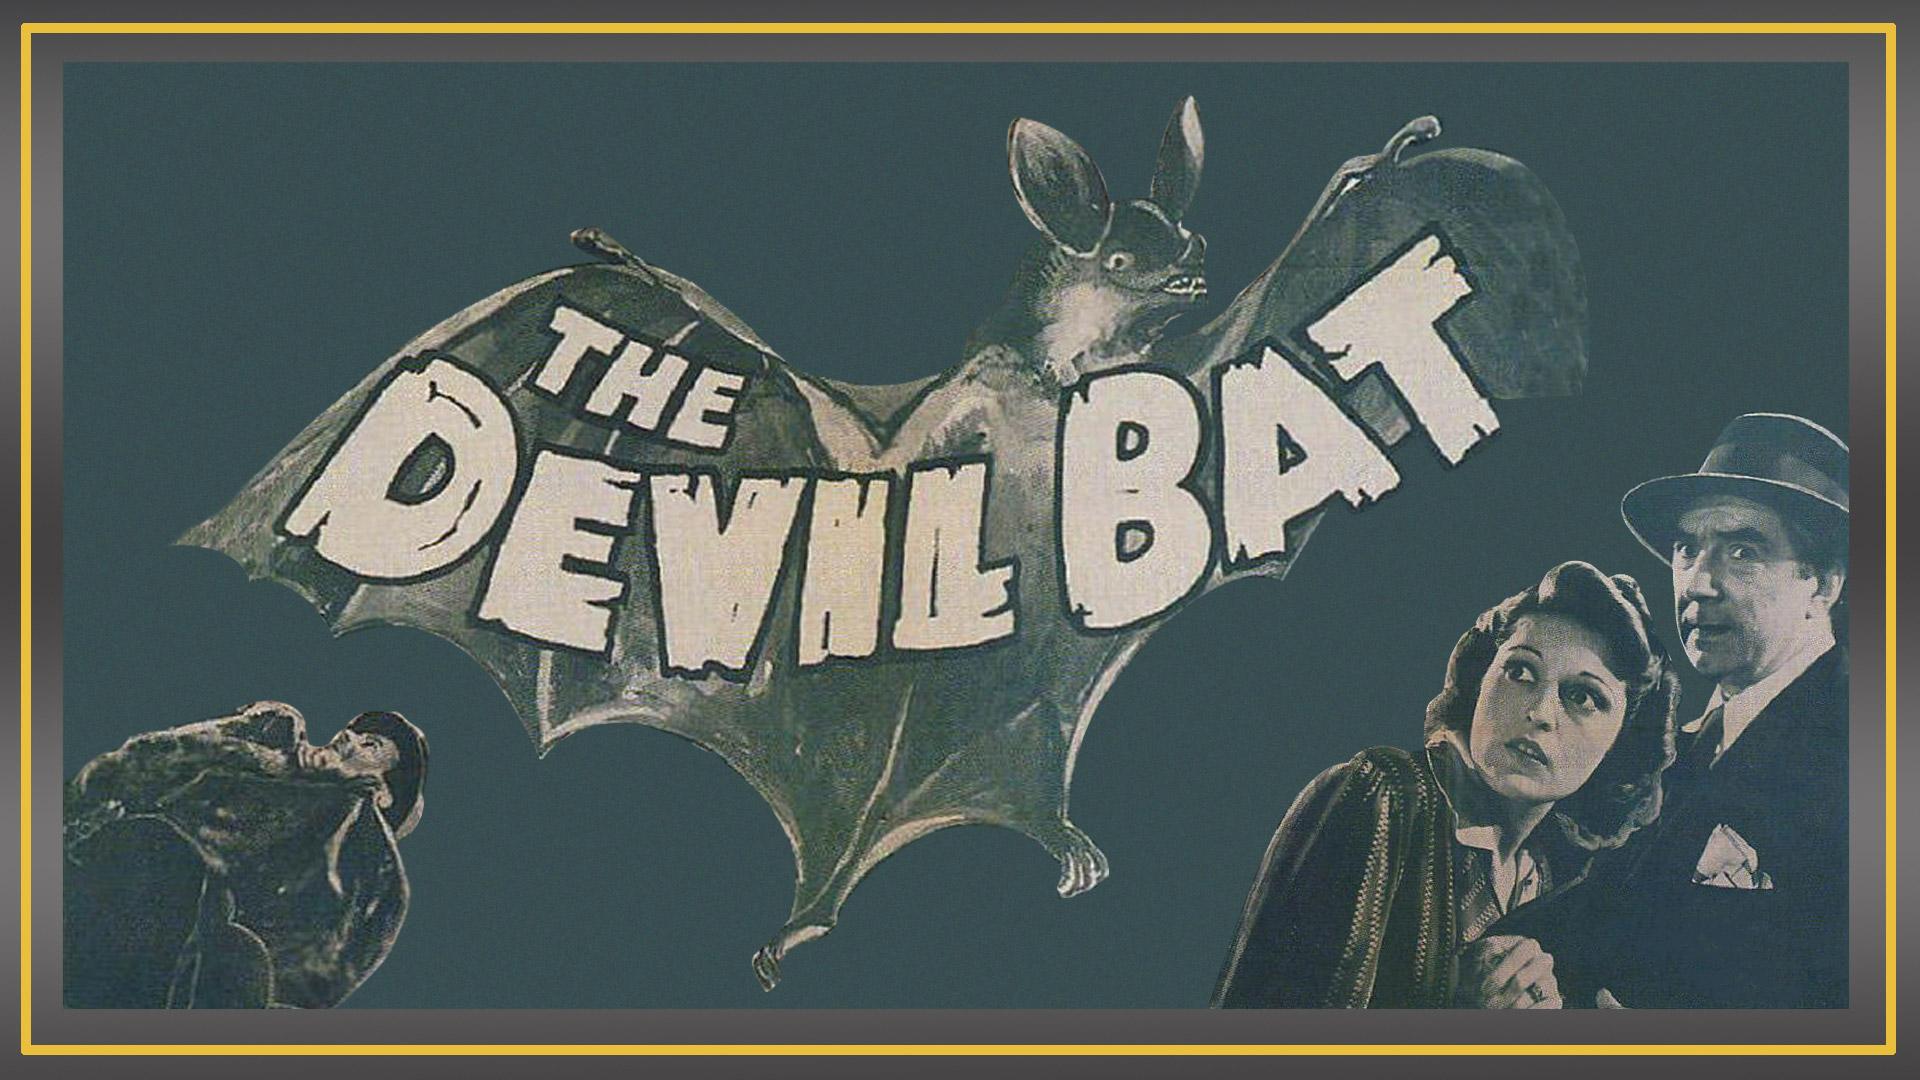 The Devil Bat (1940)